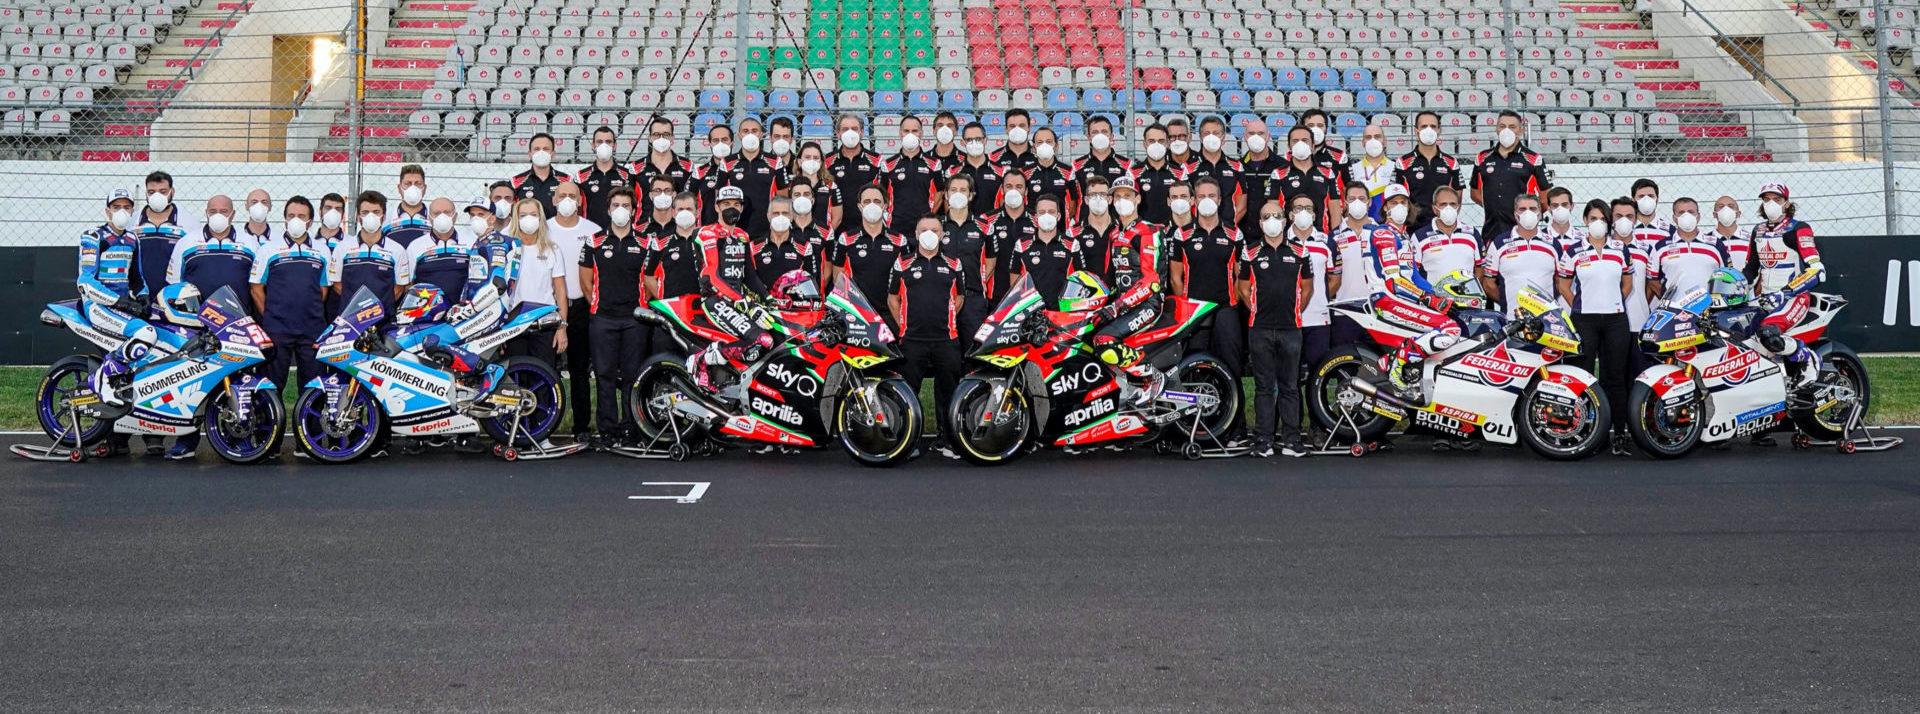 The 2020 Gresini Racing teams with the Aprilia Gresini MotoGP unit in the middle. Photo courtesy Gresini Racing.